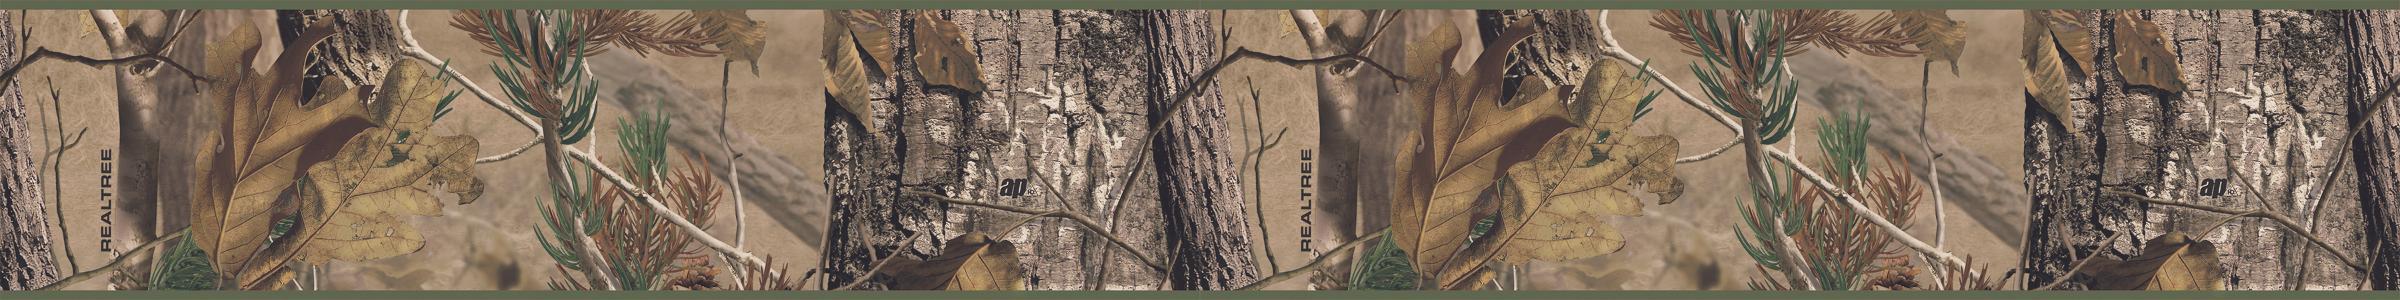 York Wallcovering Realtree AP Border Search Results 2400x300